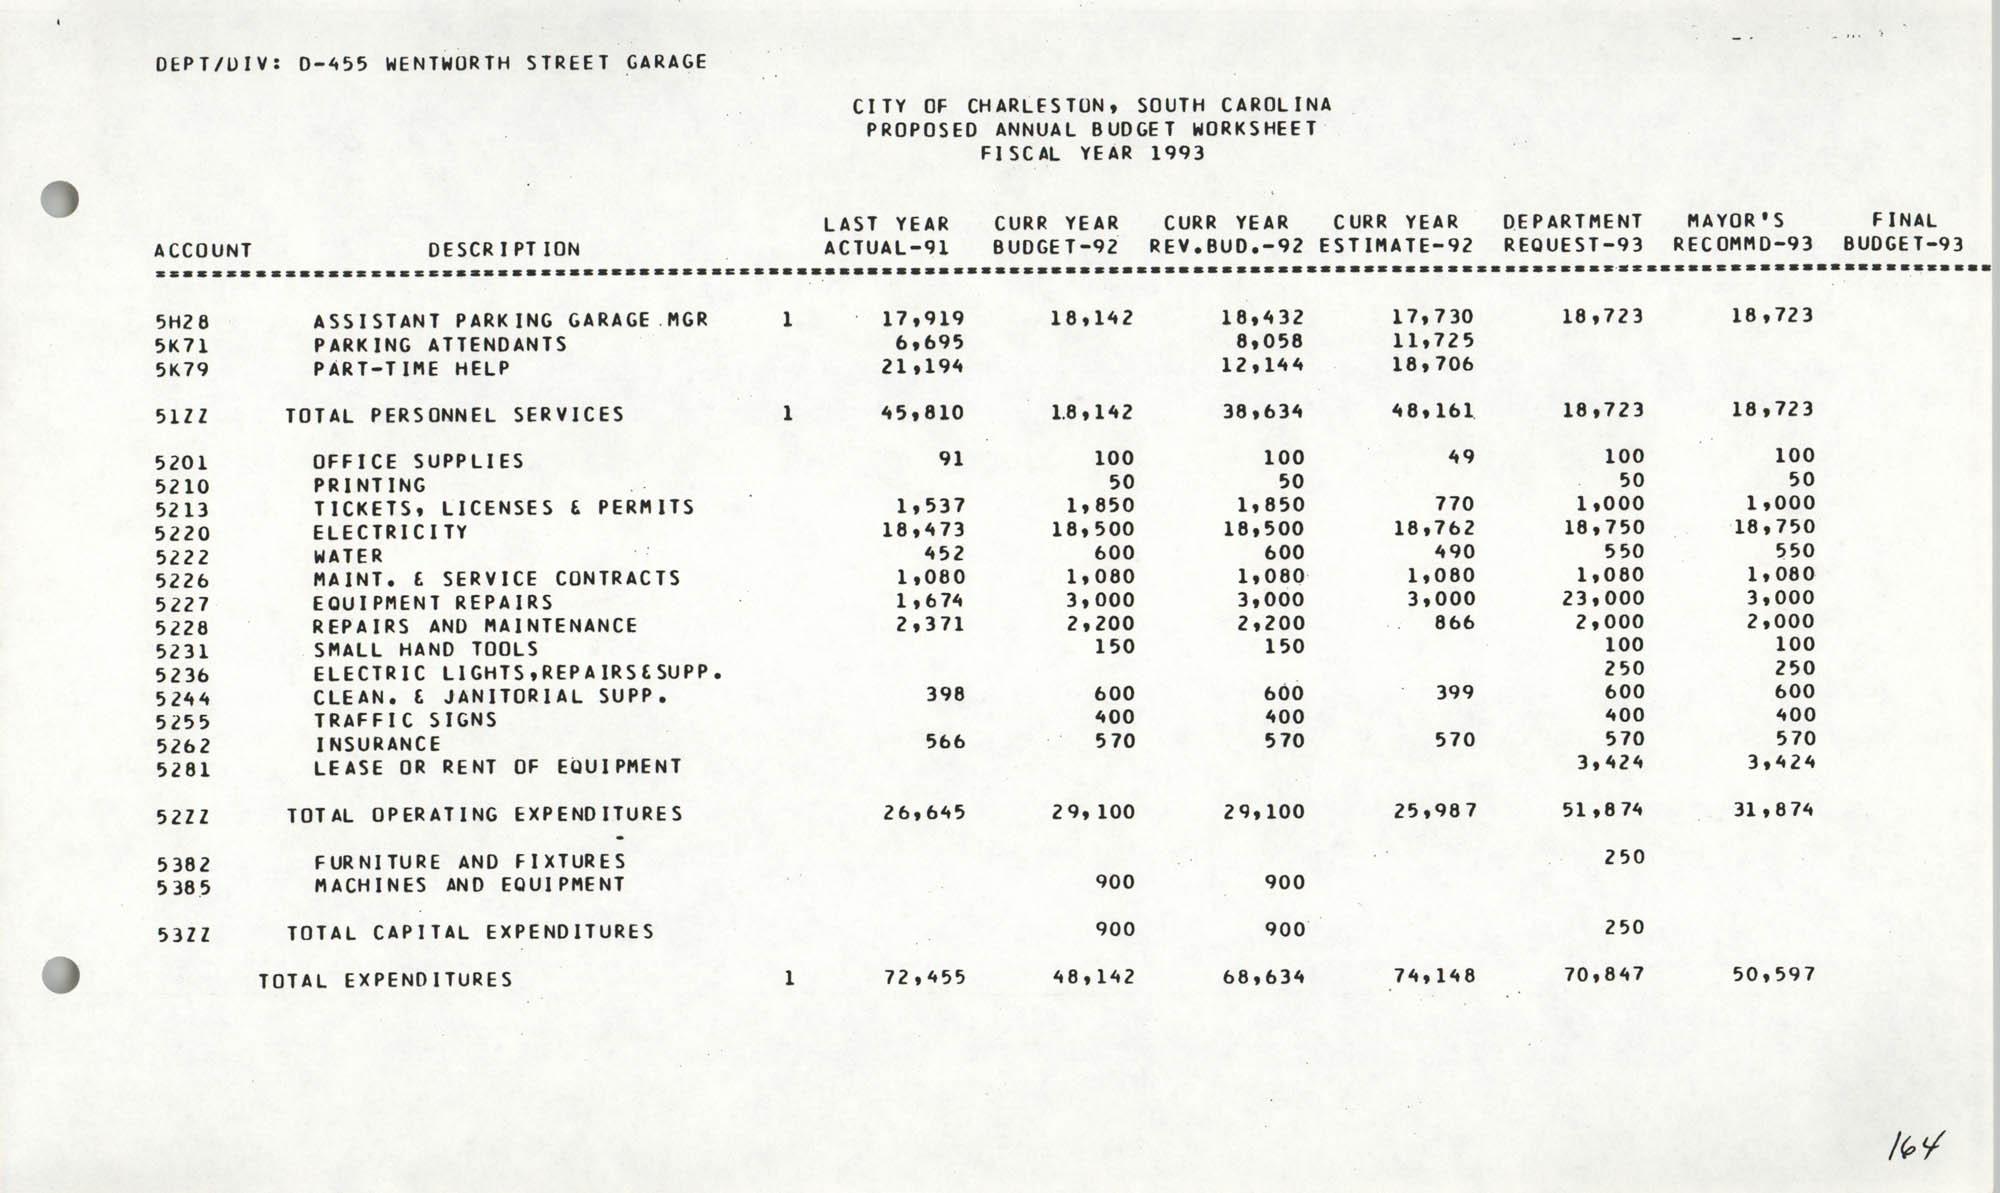 The City Council of Charleston, South Carolina, 1993 Budget, Page 164